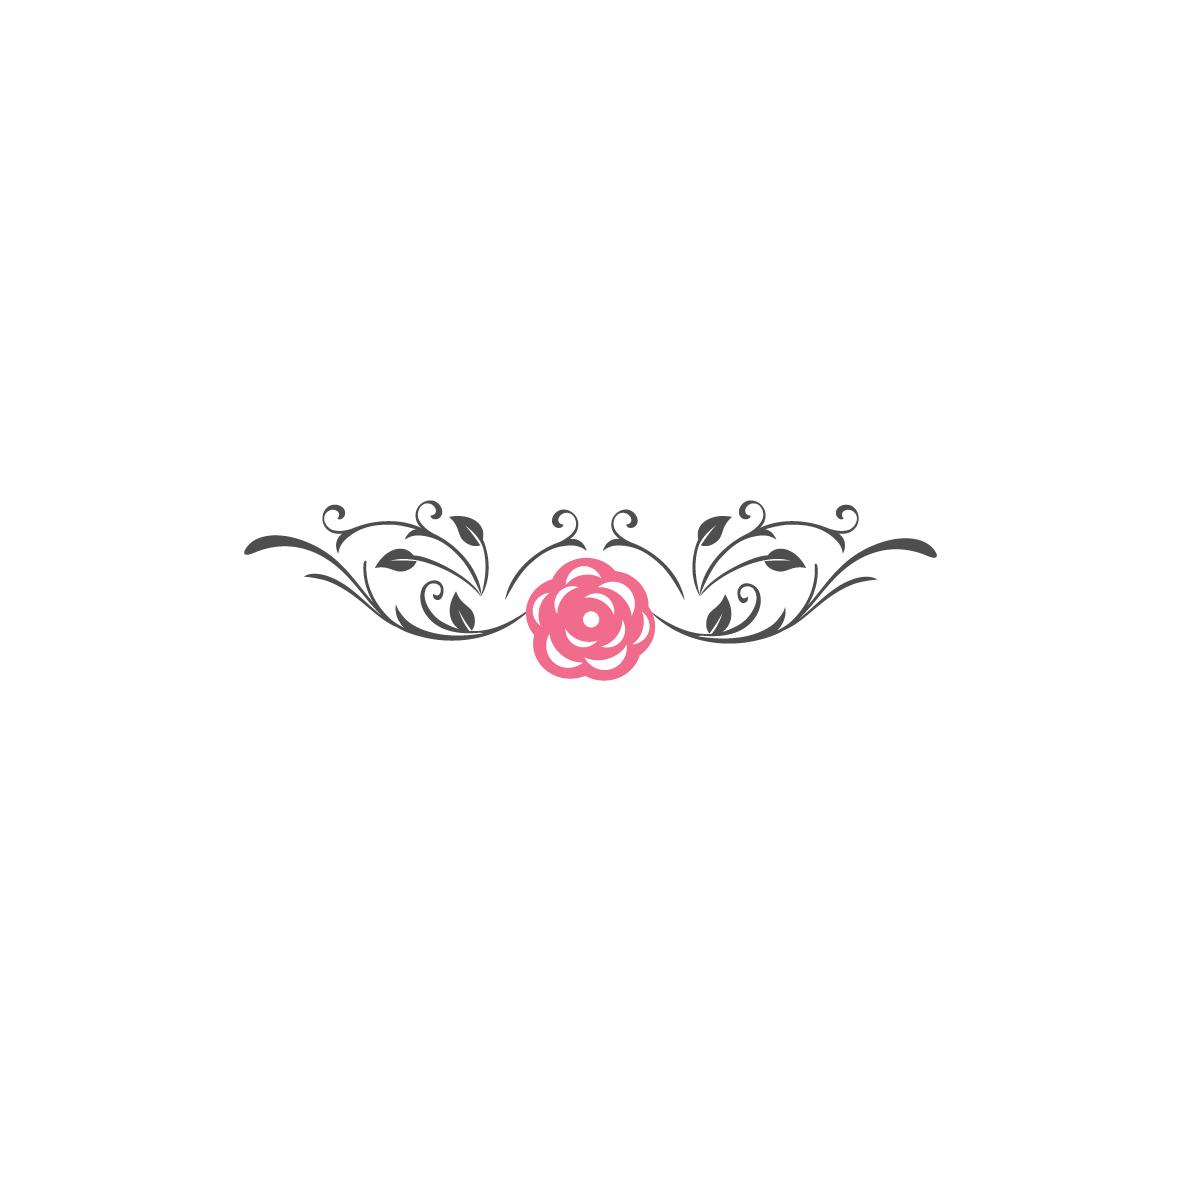 Pixel drop kuwait logo design for the english nail spa in al jabriya kuwait prinsesfo Choice Image